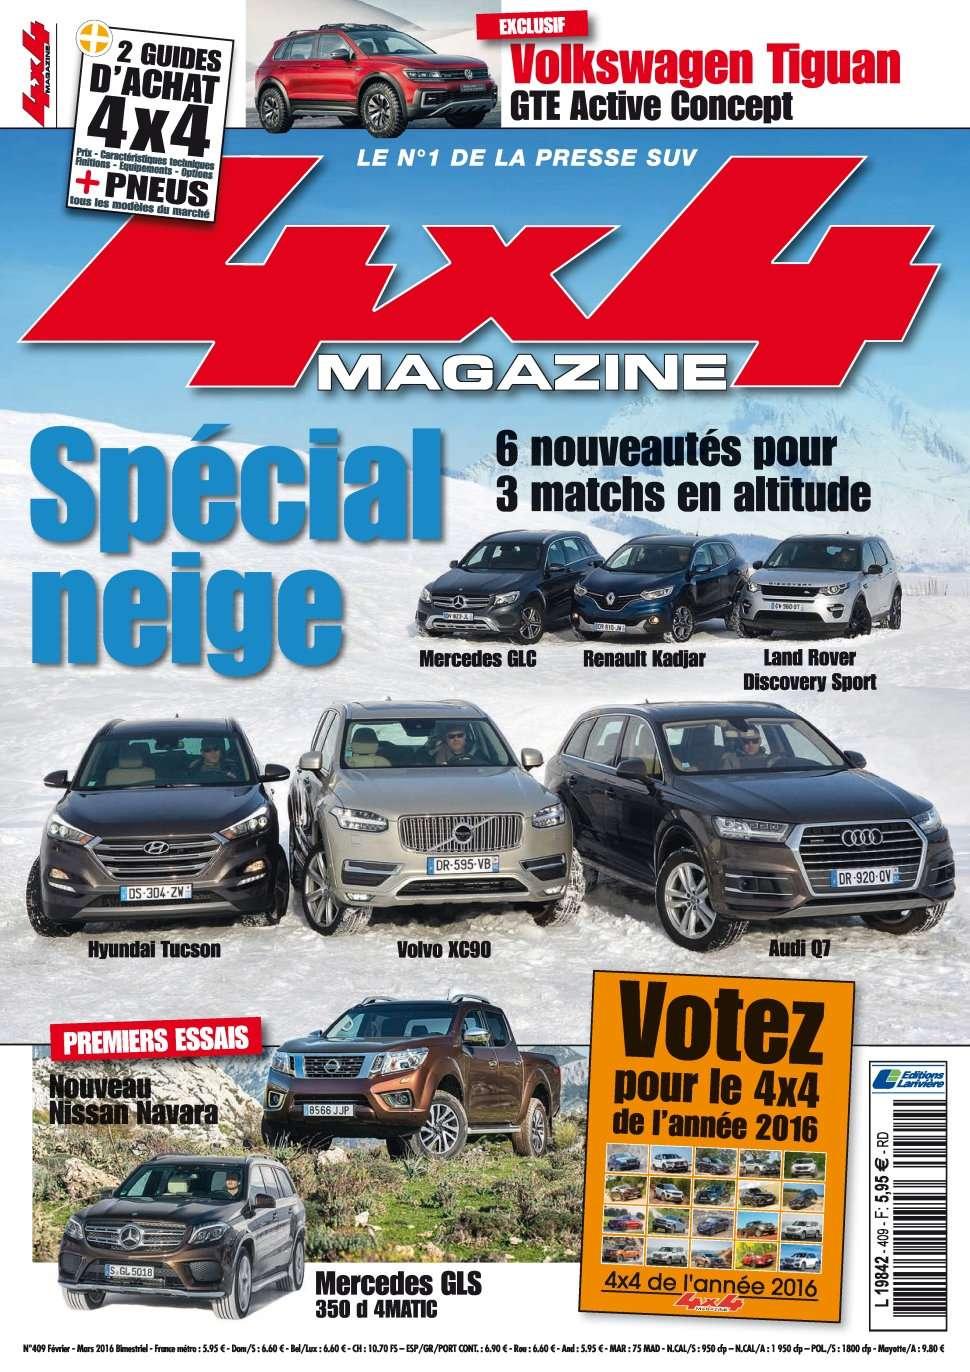 4x4 magazine 409 - Février/Mars 2016